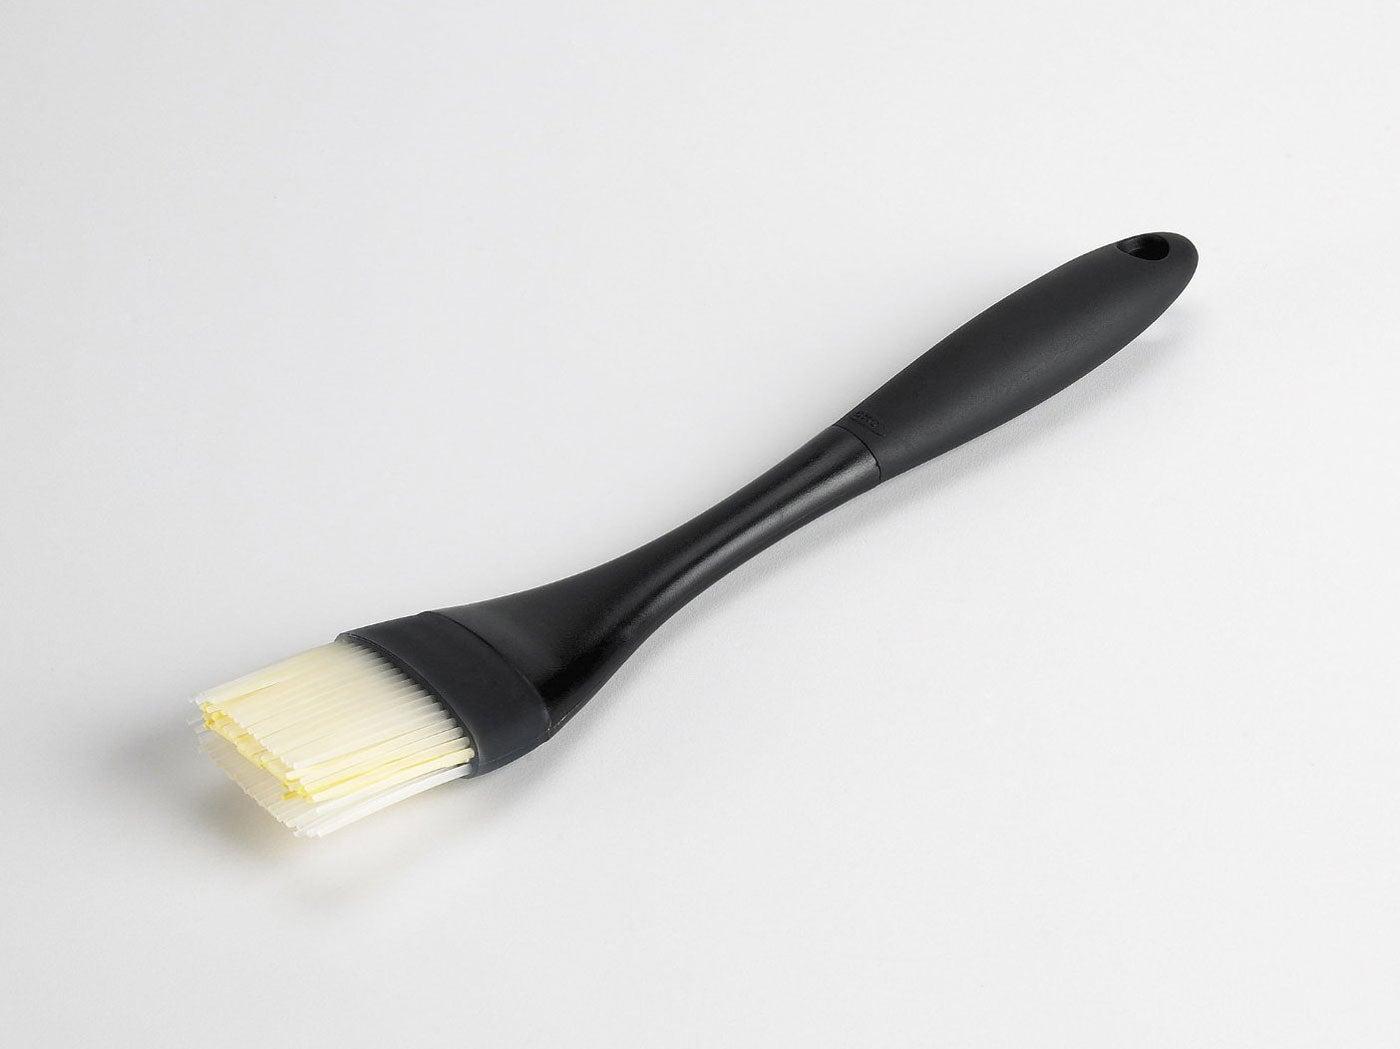 OXO Pastry Brush